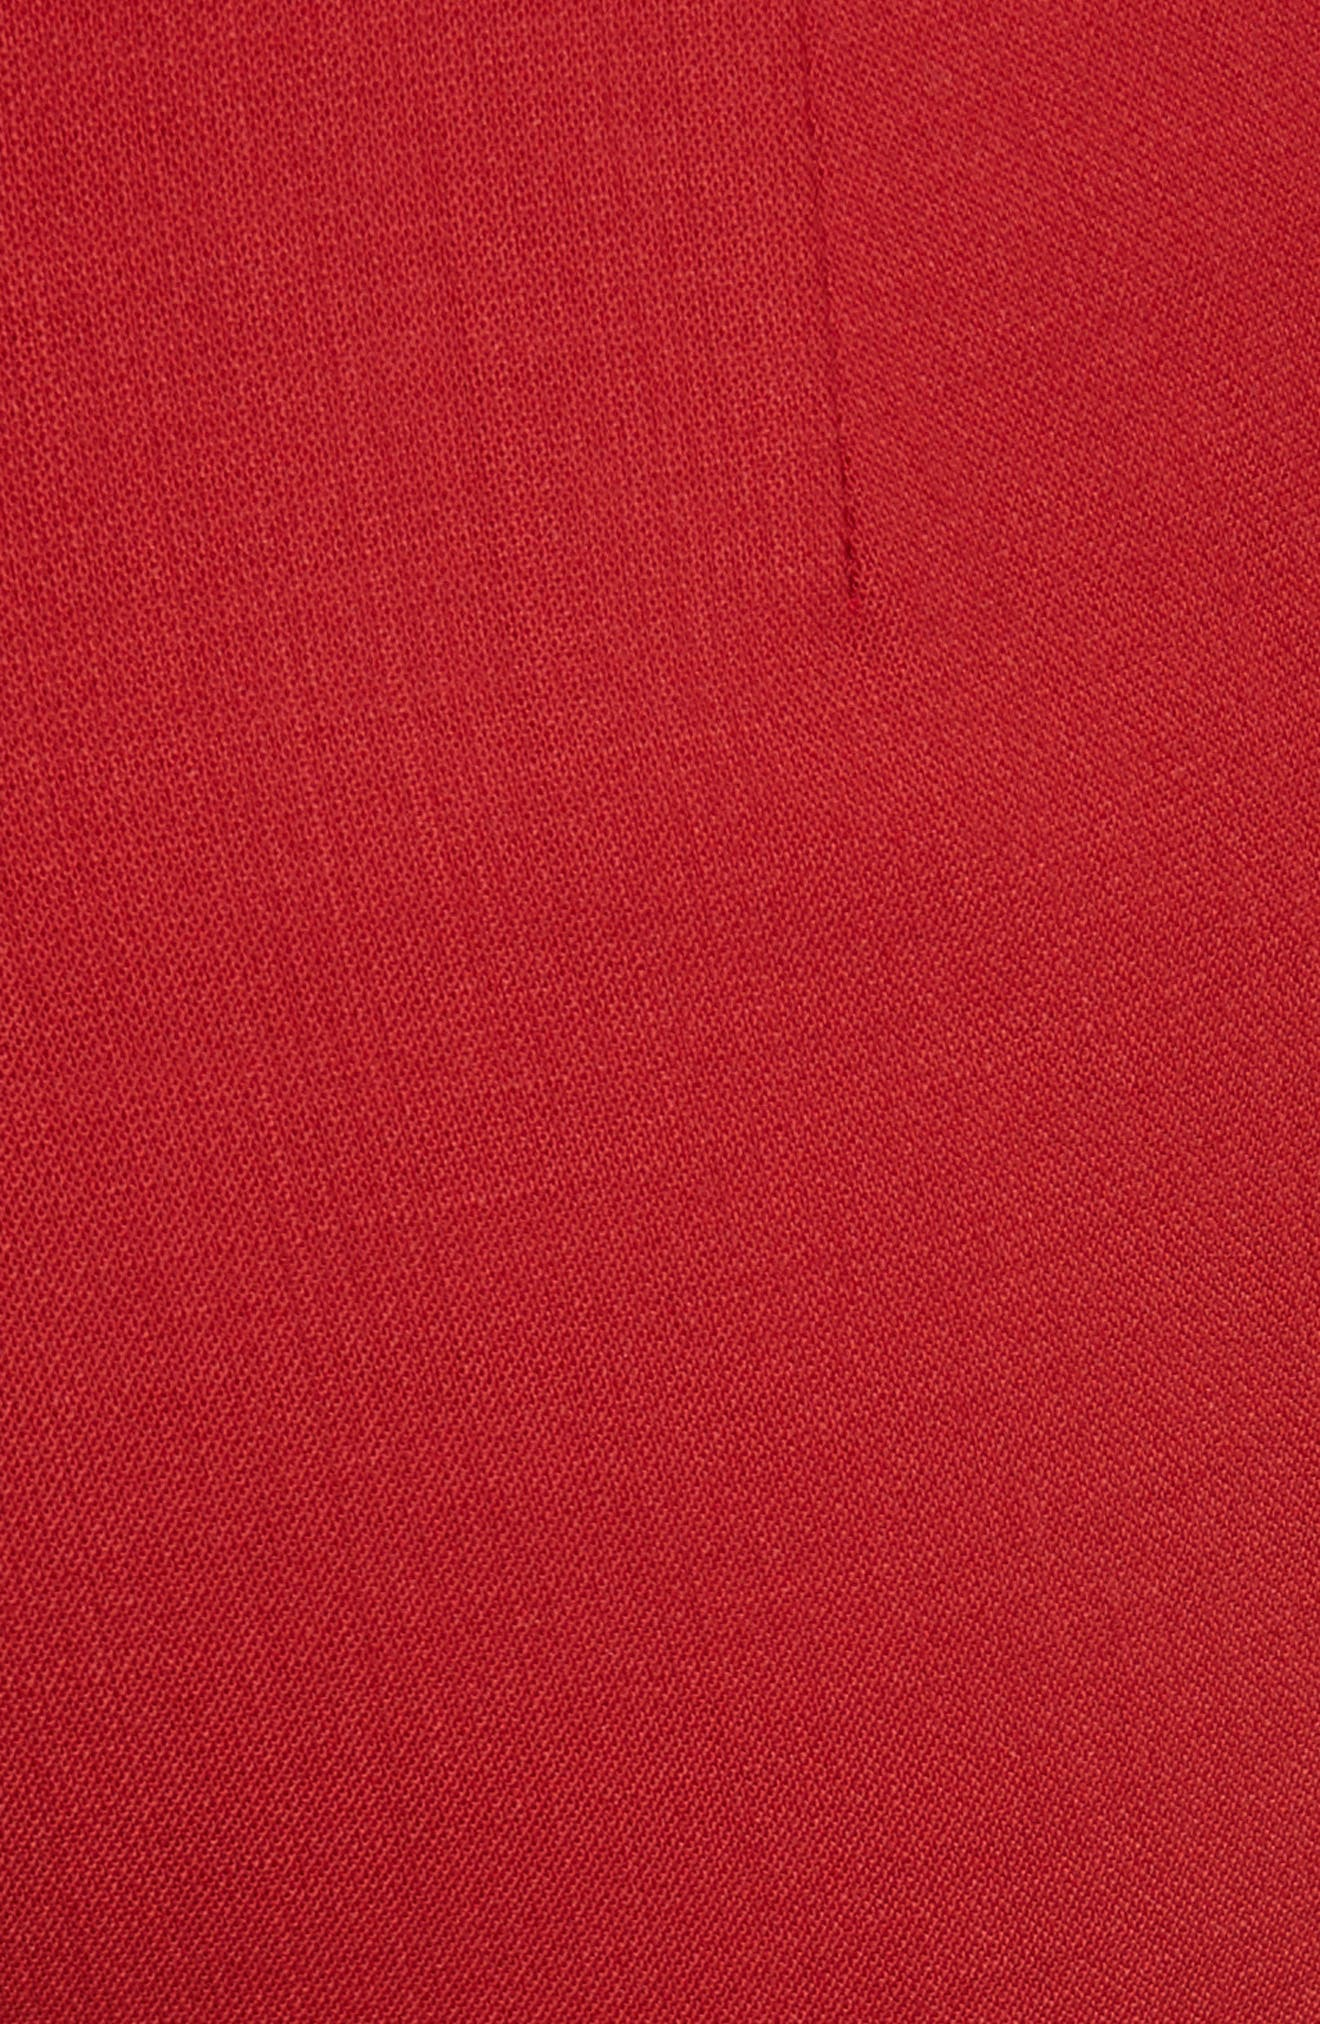 Alternate Image 5  - Max Mara Oscuro Stretch Wool Pants